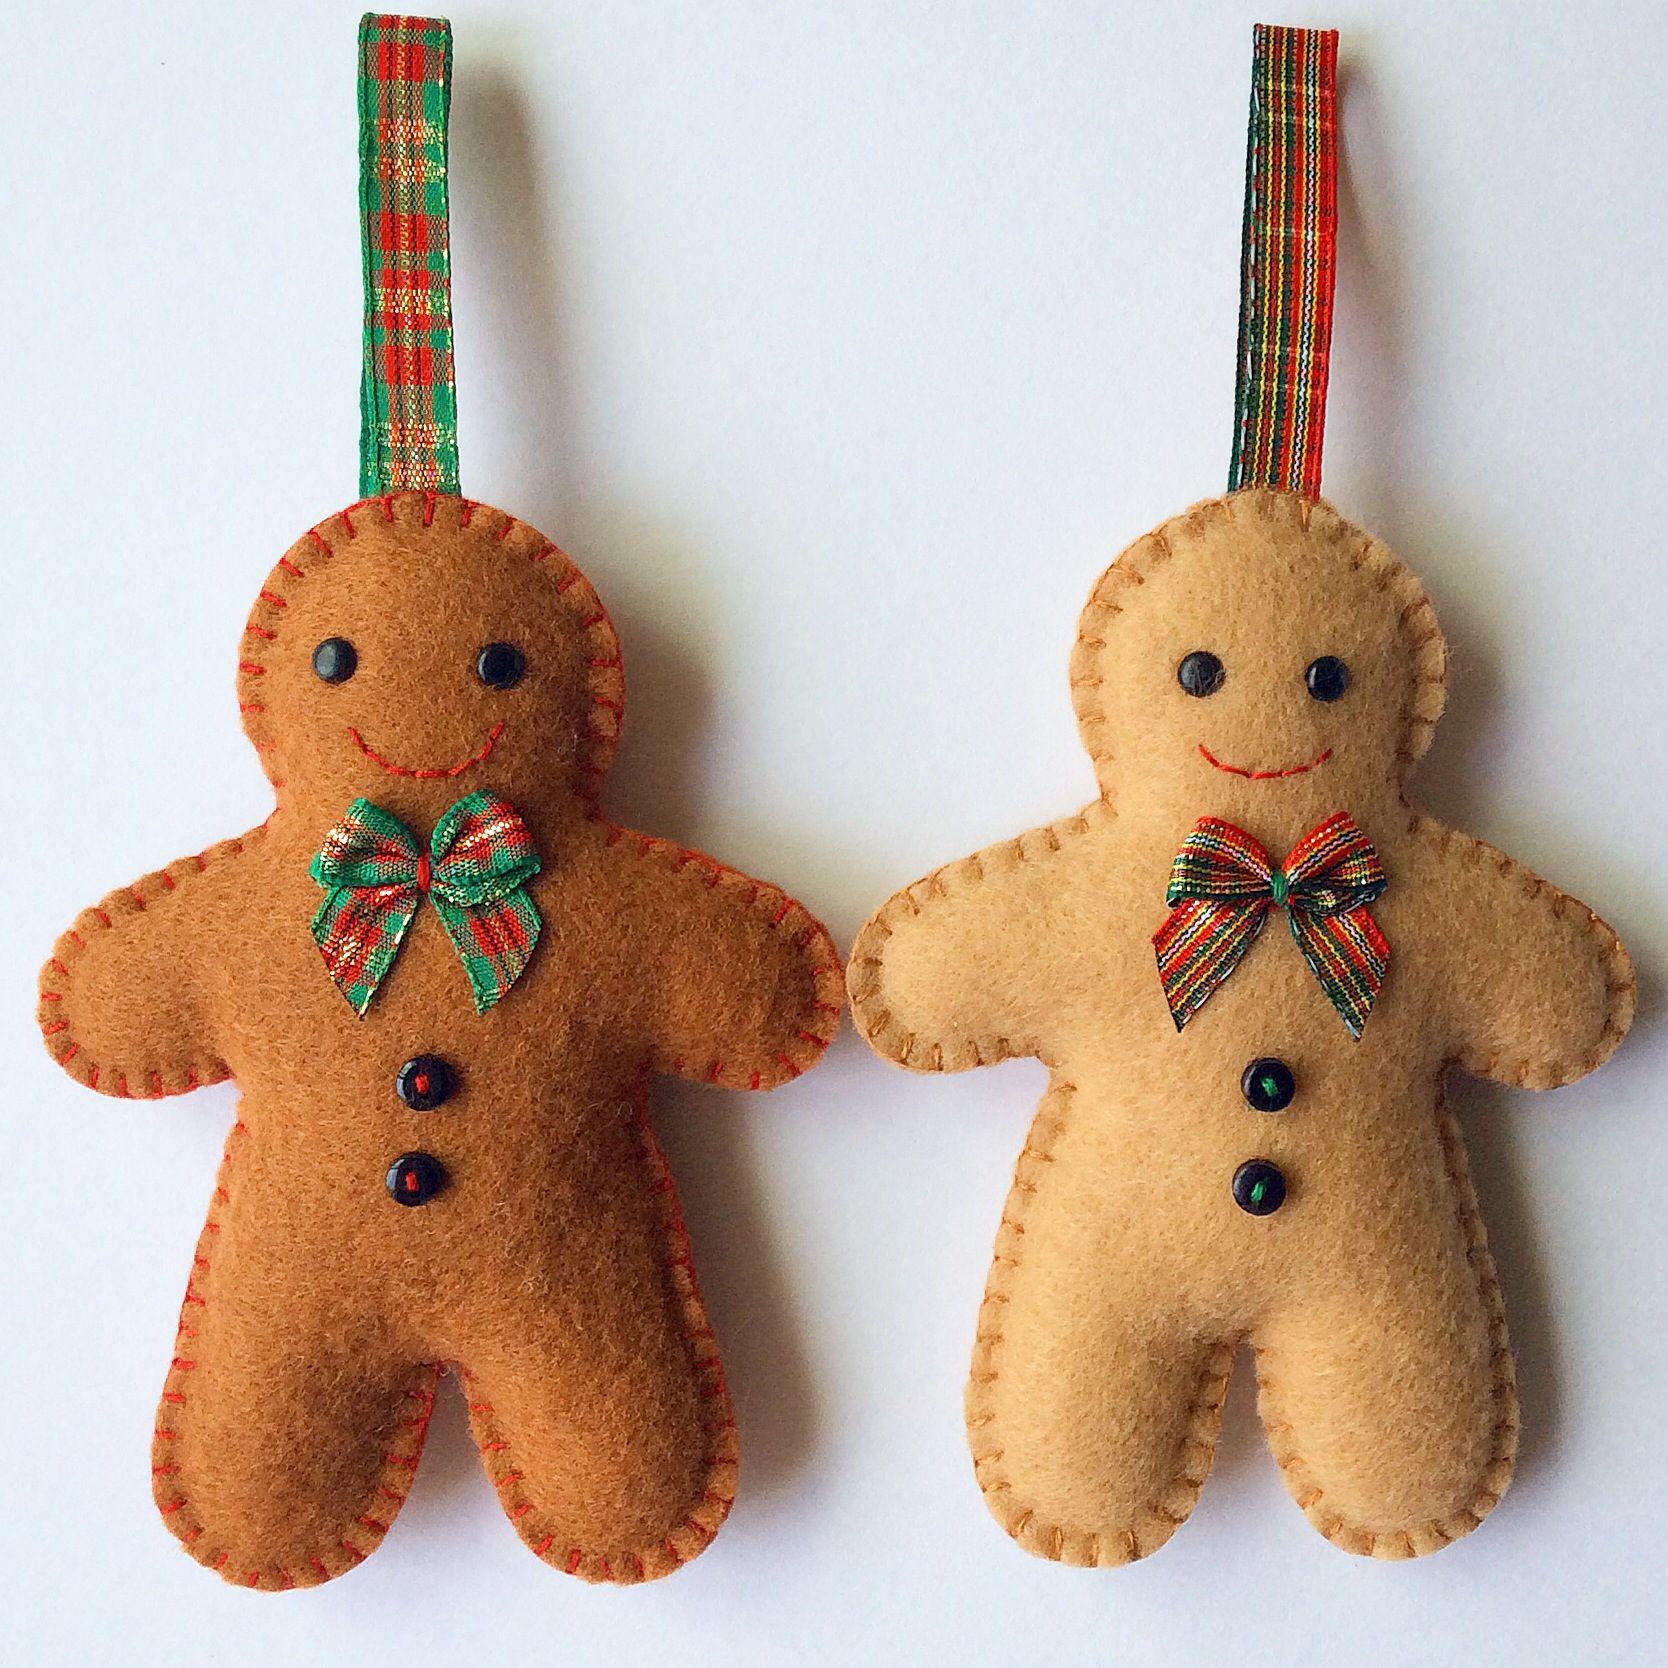 Gingerbread man decorations crafts handmade felt sewjunejones wool felt winter christmas - Decorations for gingerbread man ...